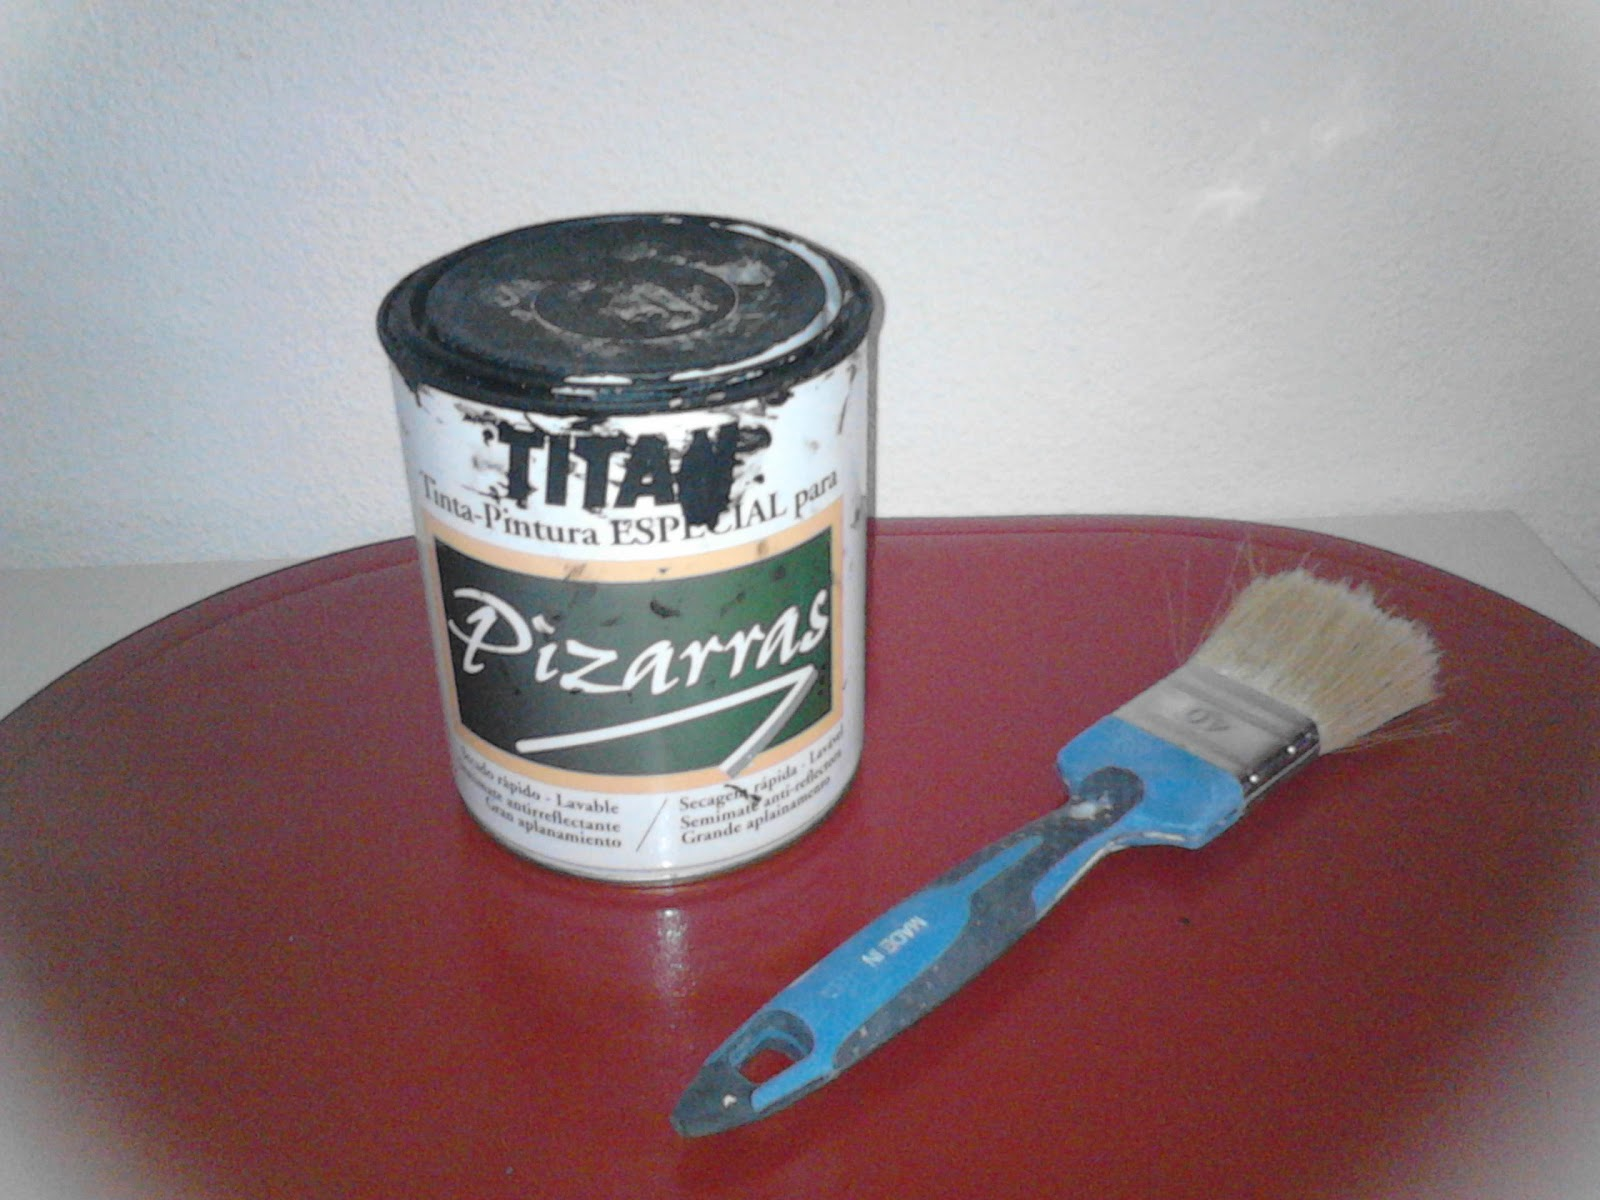 La tita sonia ikea pintura pizarra - Pintura pizarra rotulador ...